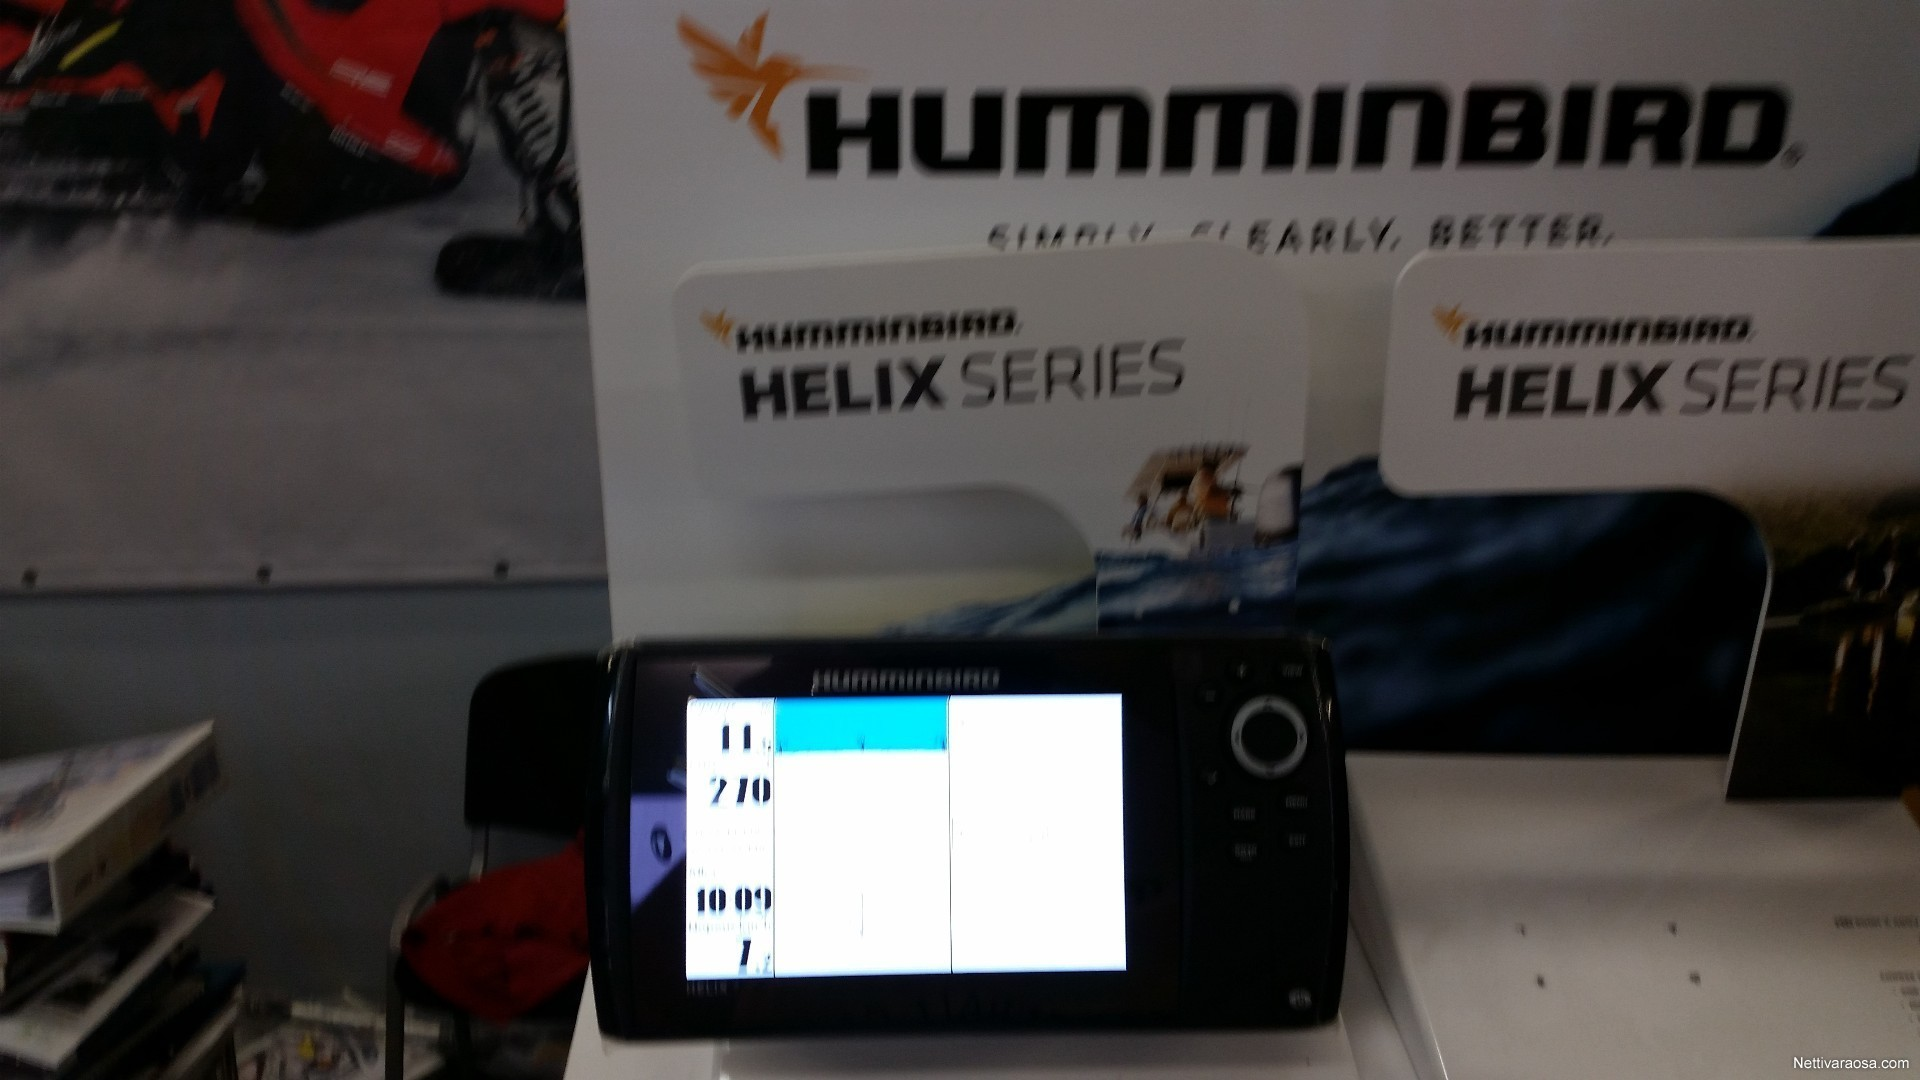 Humminbird Helix 7 si 2018 - Kaiku/plotteri - Boat accessories and parts -  Nettivaraosa